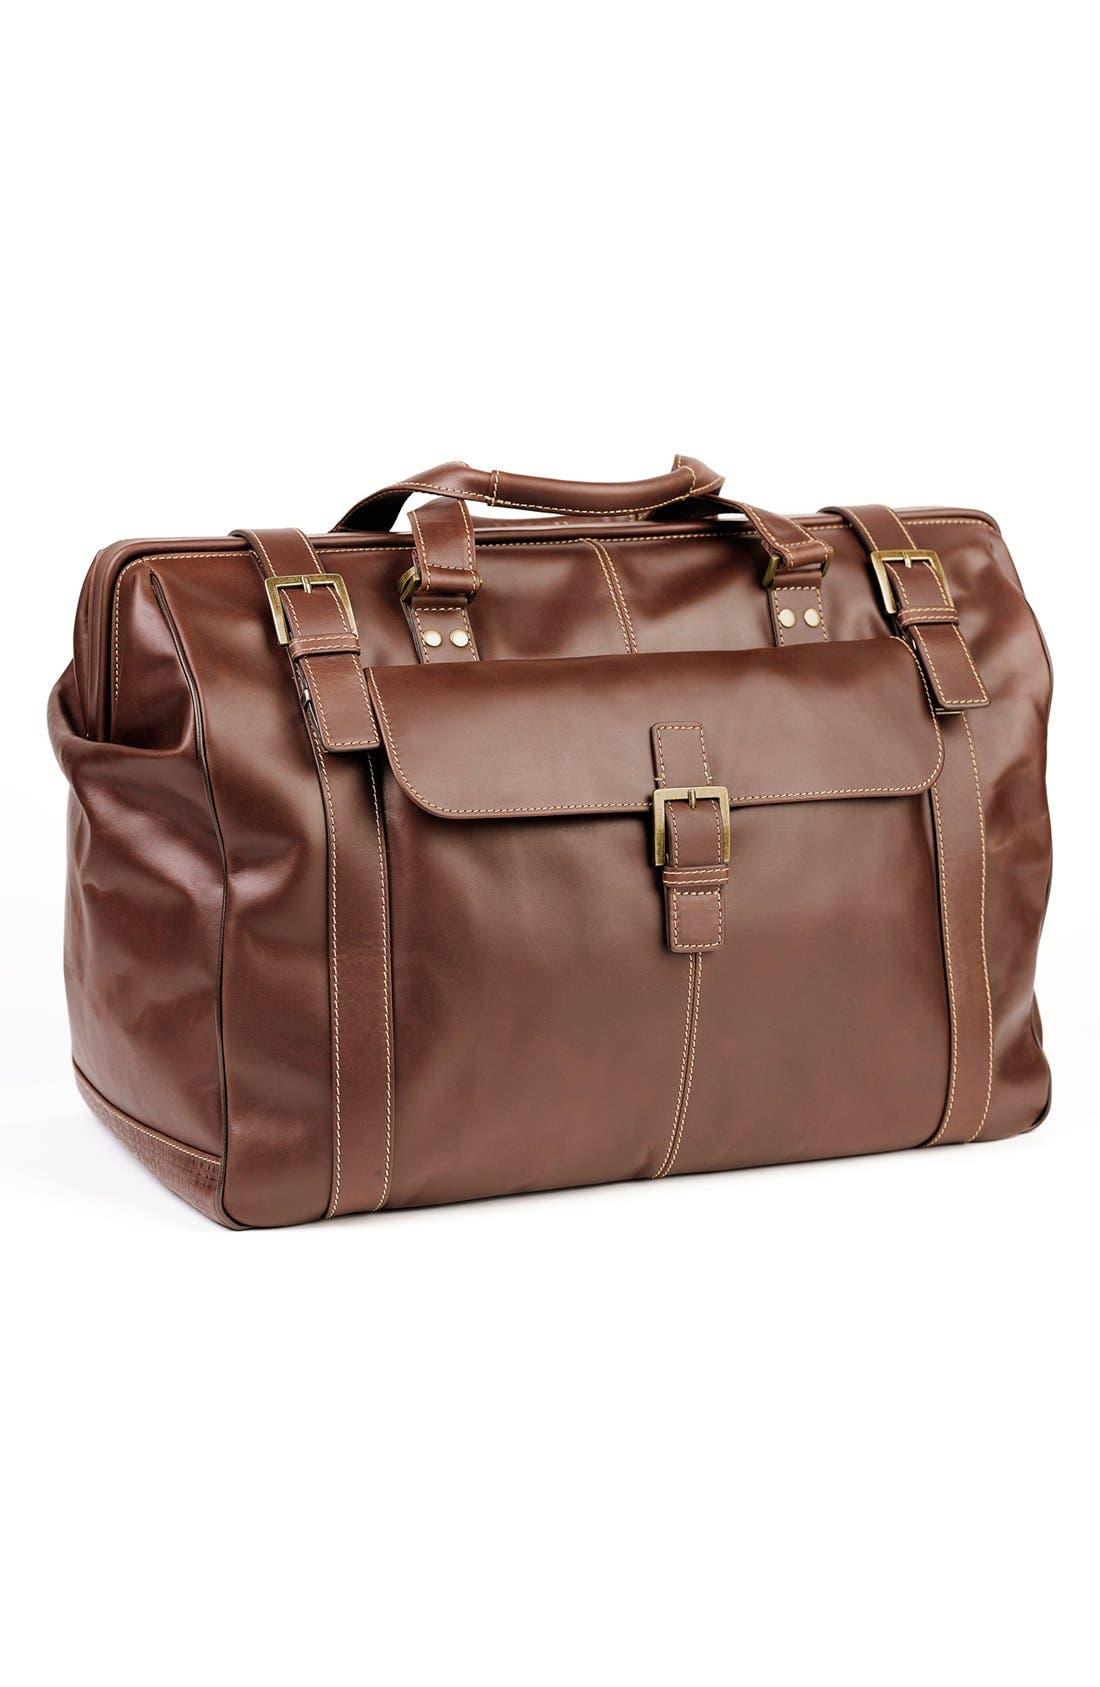 'Bryant' Duffel Bag,                         Main,                         color, ANTIQUE MAHOGANY